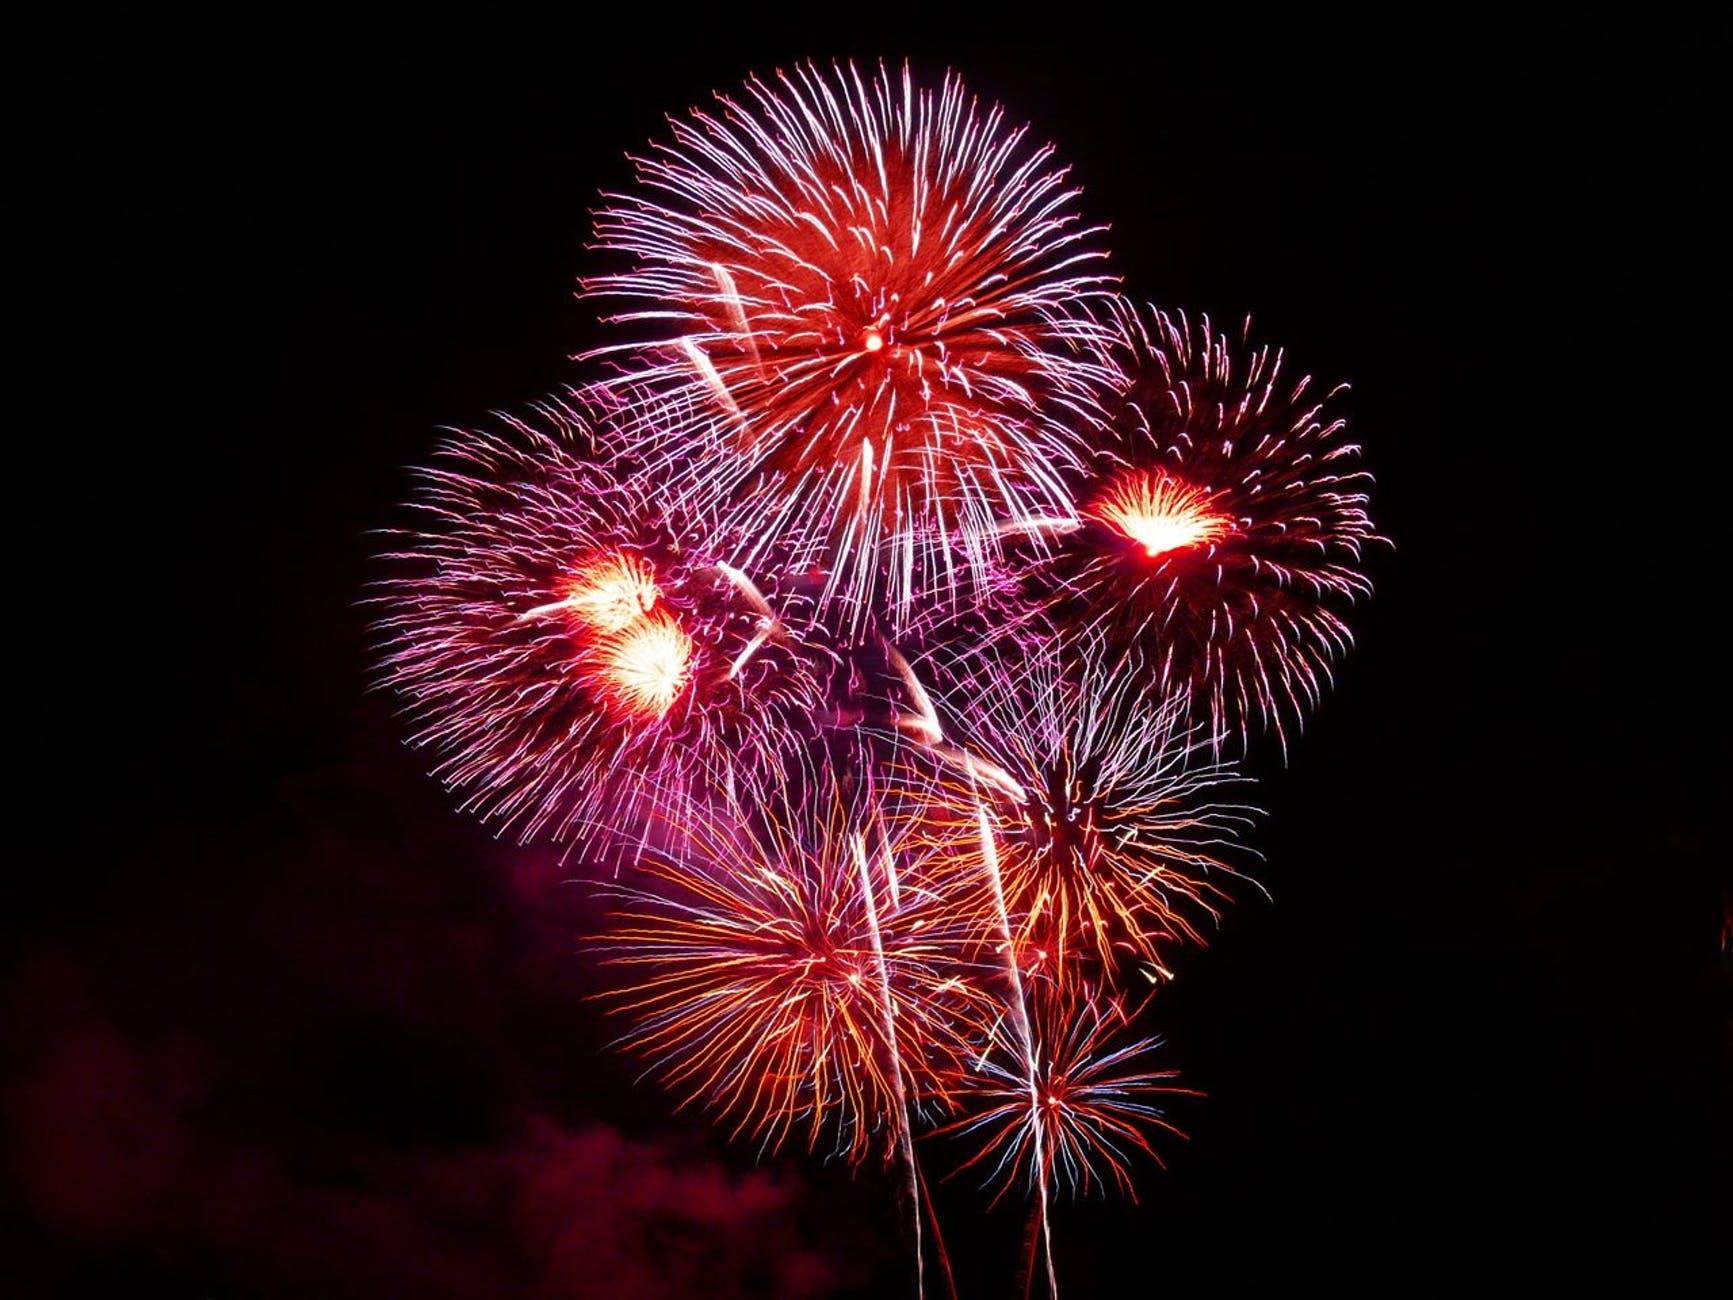 purple red white and orange fireworks display